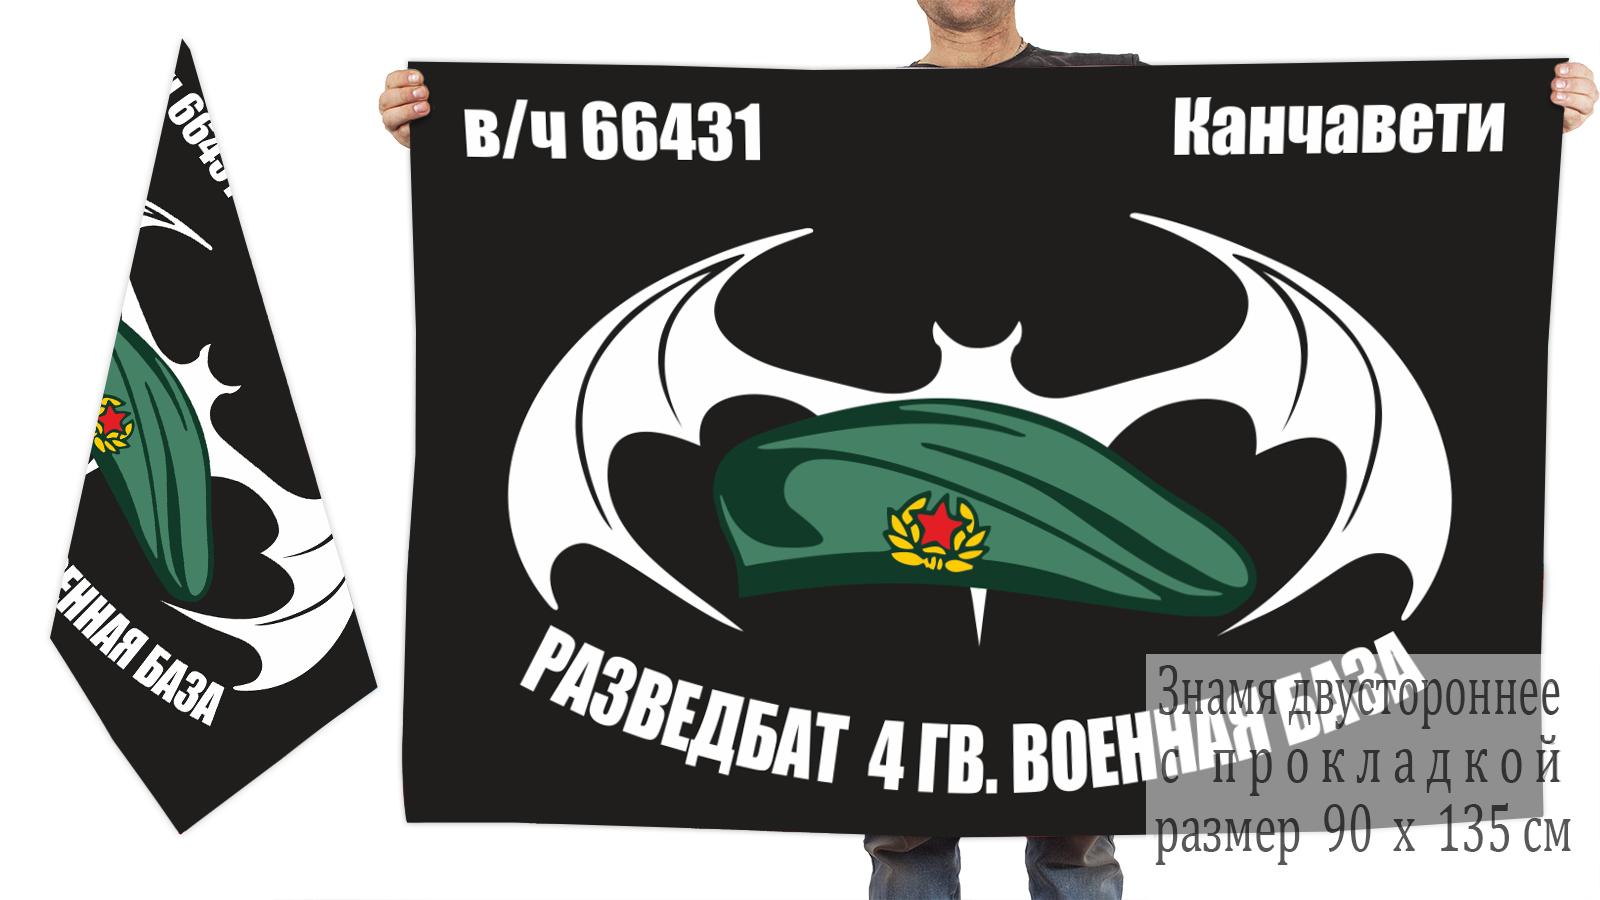 Двухсторонний флаг Разведбат 4 гв. Военная база Канчавети